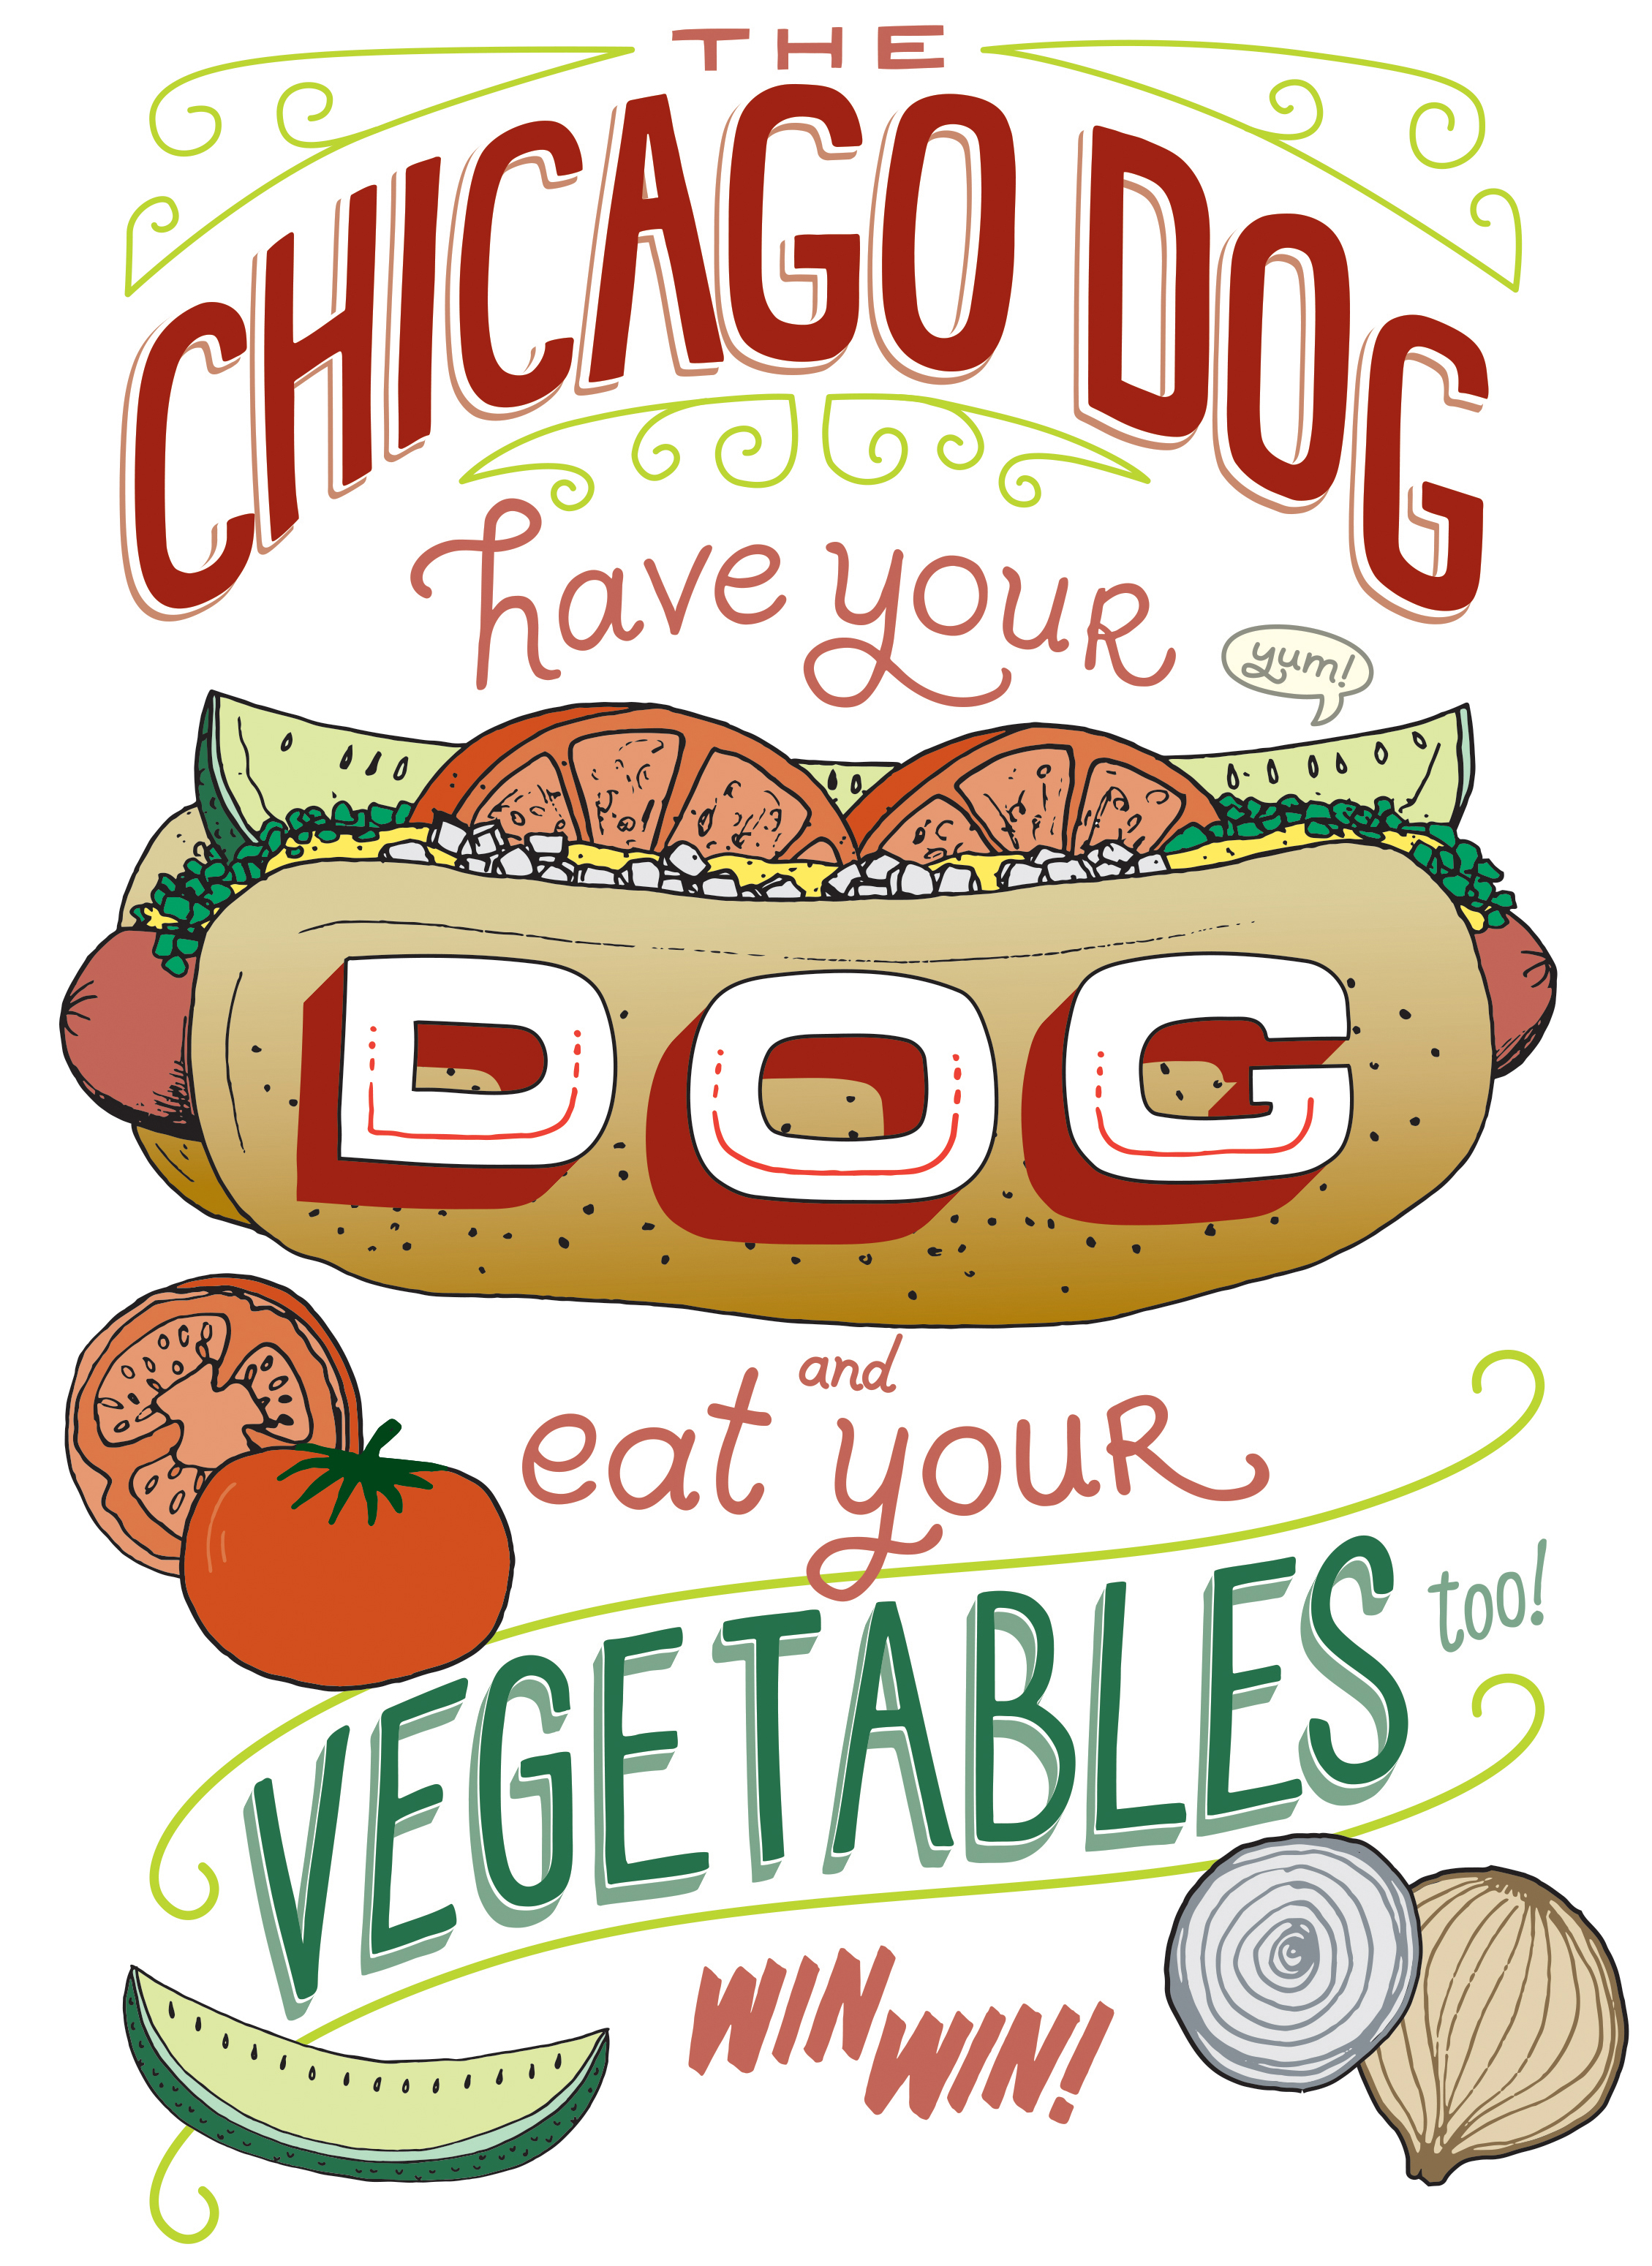 Chicago Hot Dog Lettering and Illustration